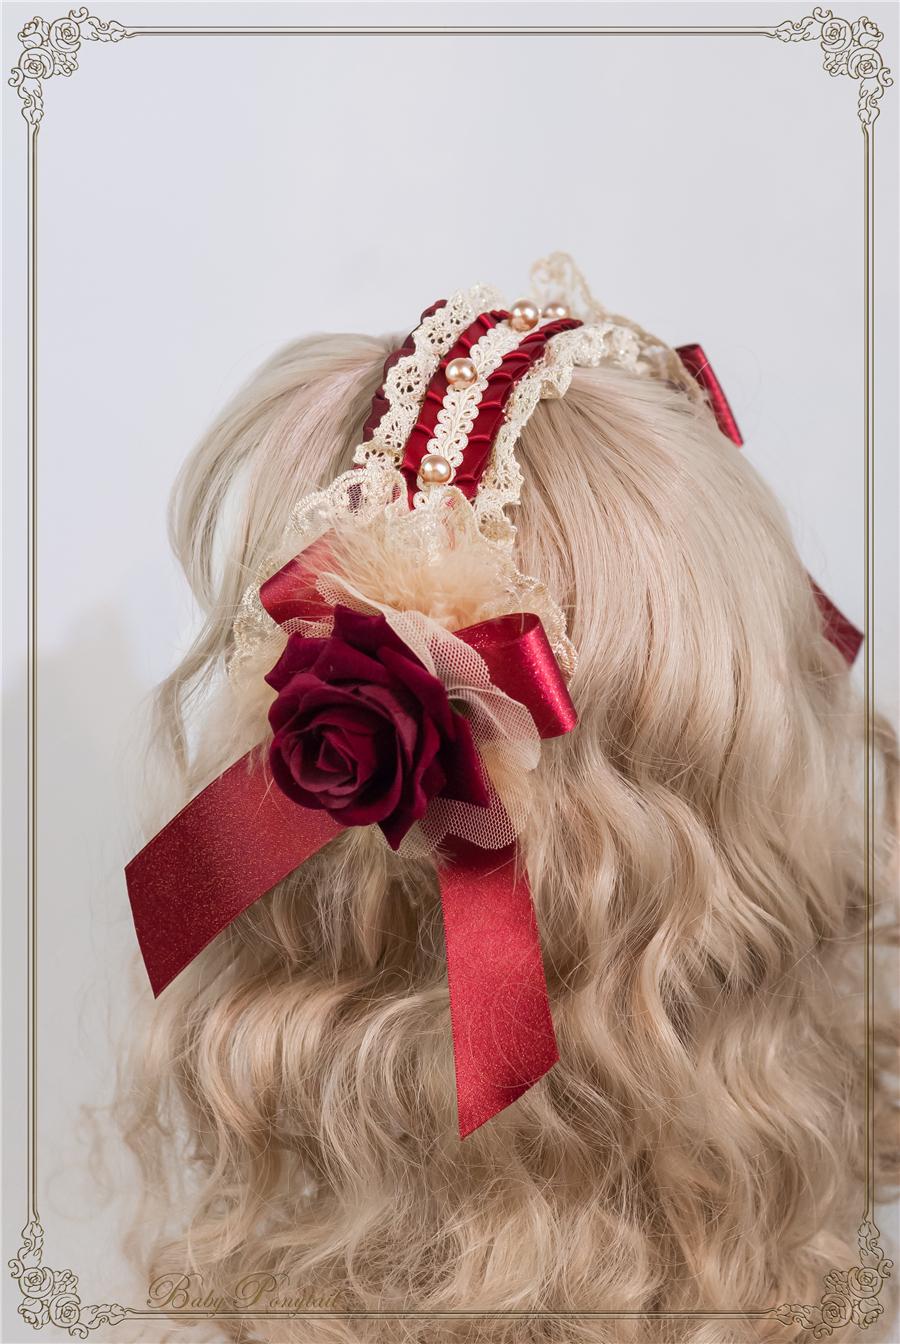 Baby Ponytail_Stock photo_Circus Princess_Rose Head Dress Red_03.jpg